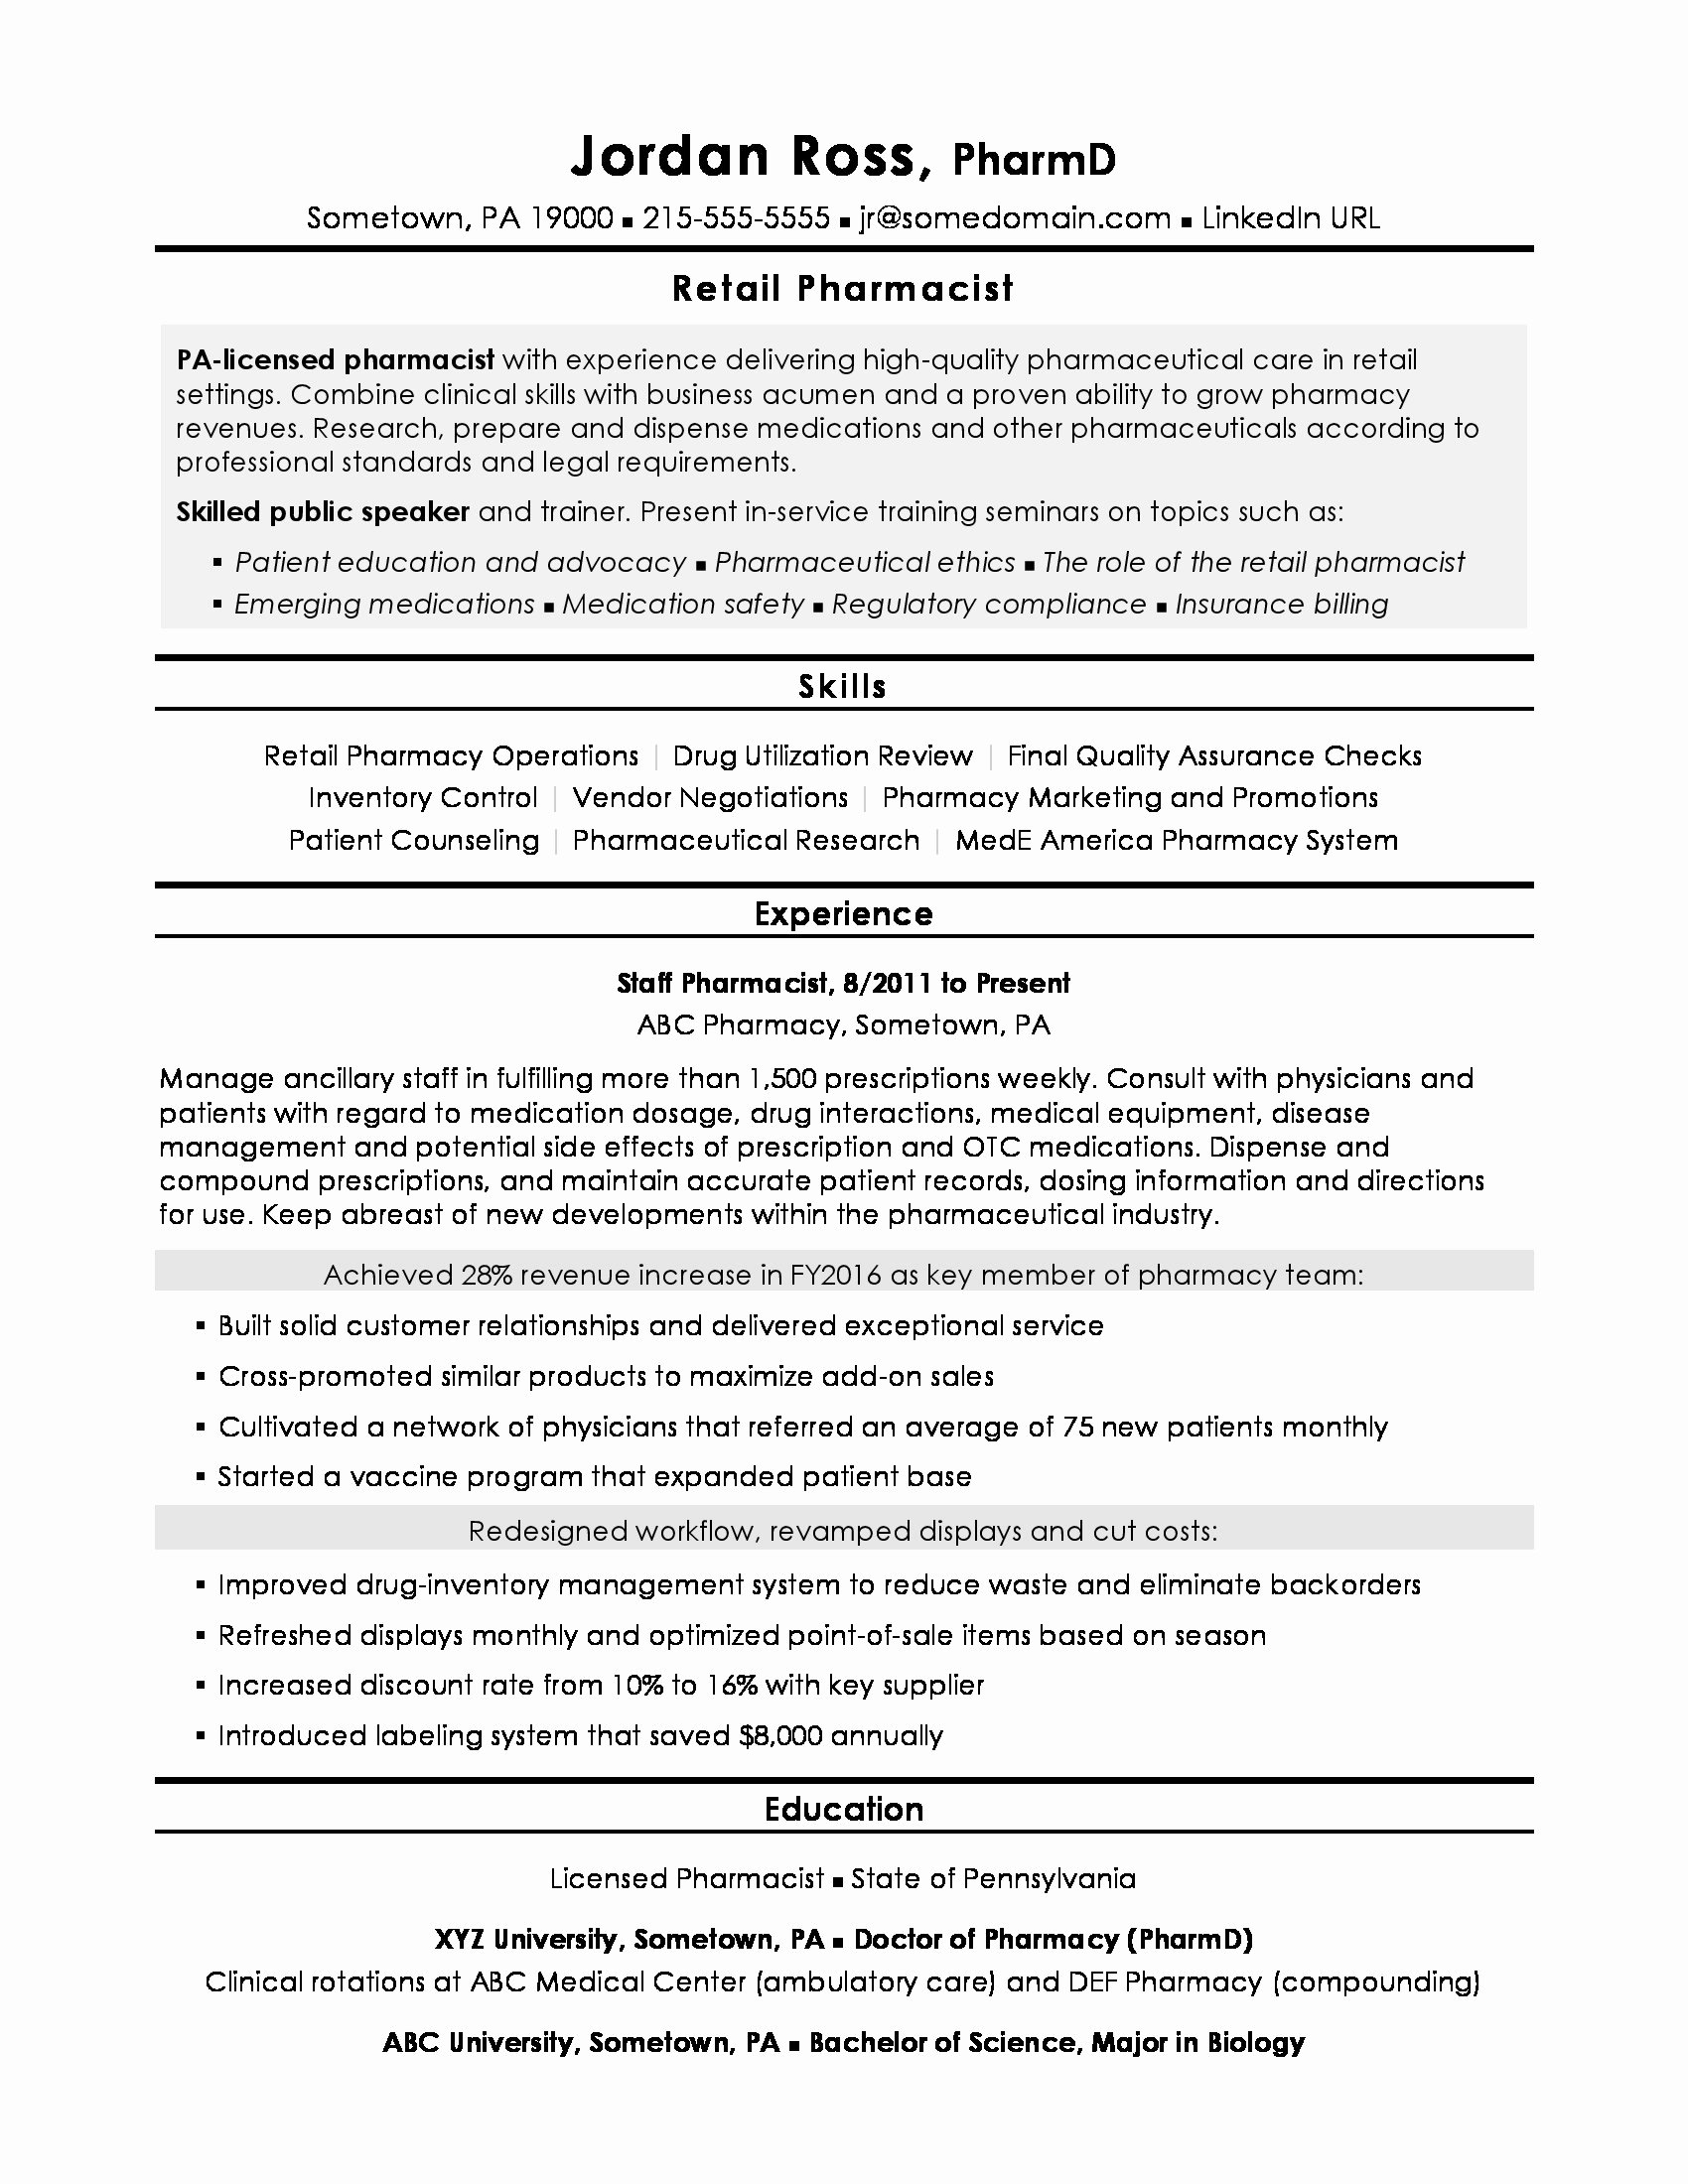 Pharmacist Curriculum Vitae Examples New Pharmacist Resume Sample